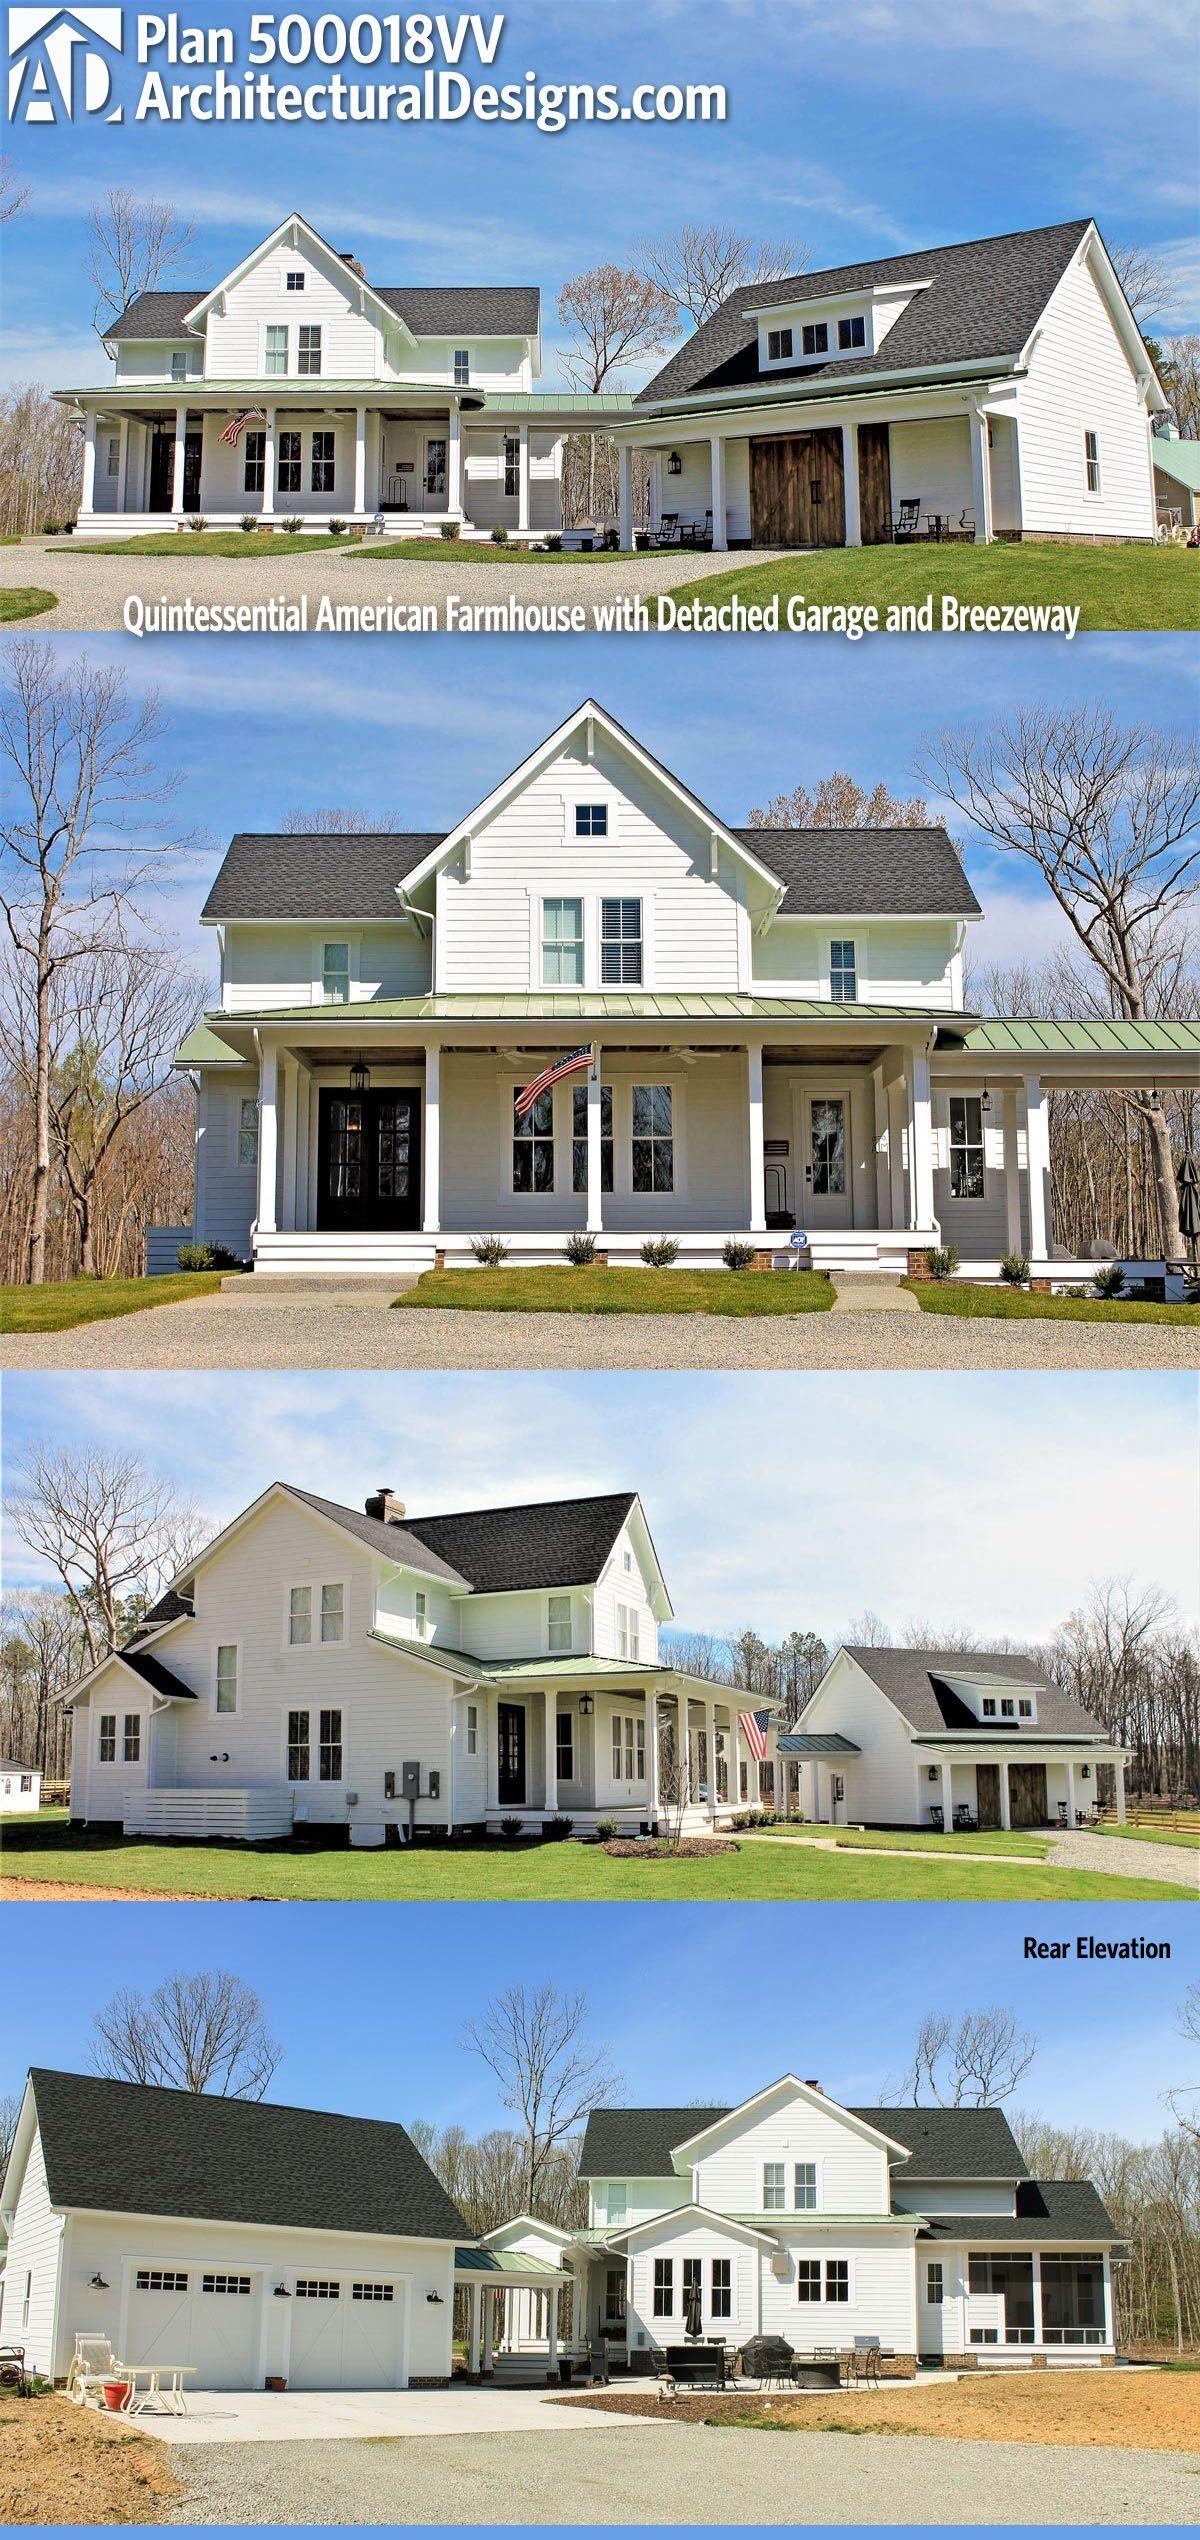 Plan 500018vv Quintessential American Farmhouse With Detached Garage And Breezeway Farmhouse Architecture Farmhouse Plans American Farmhouse